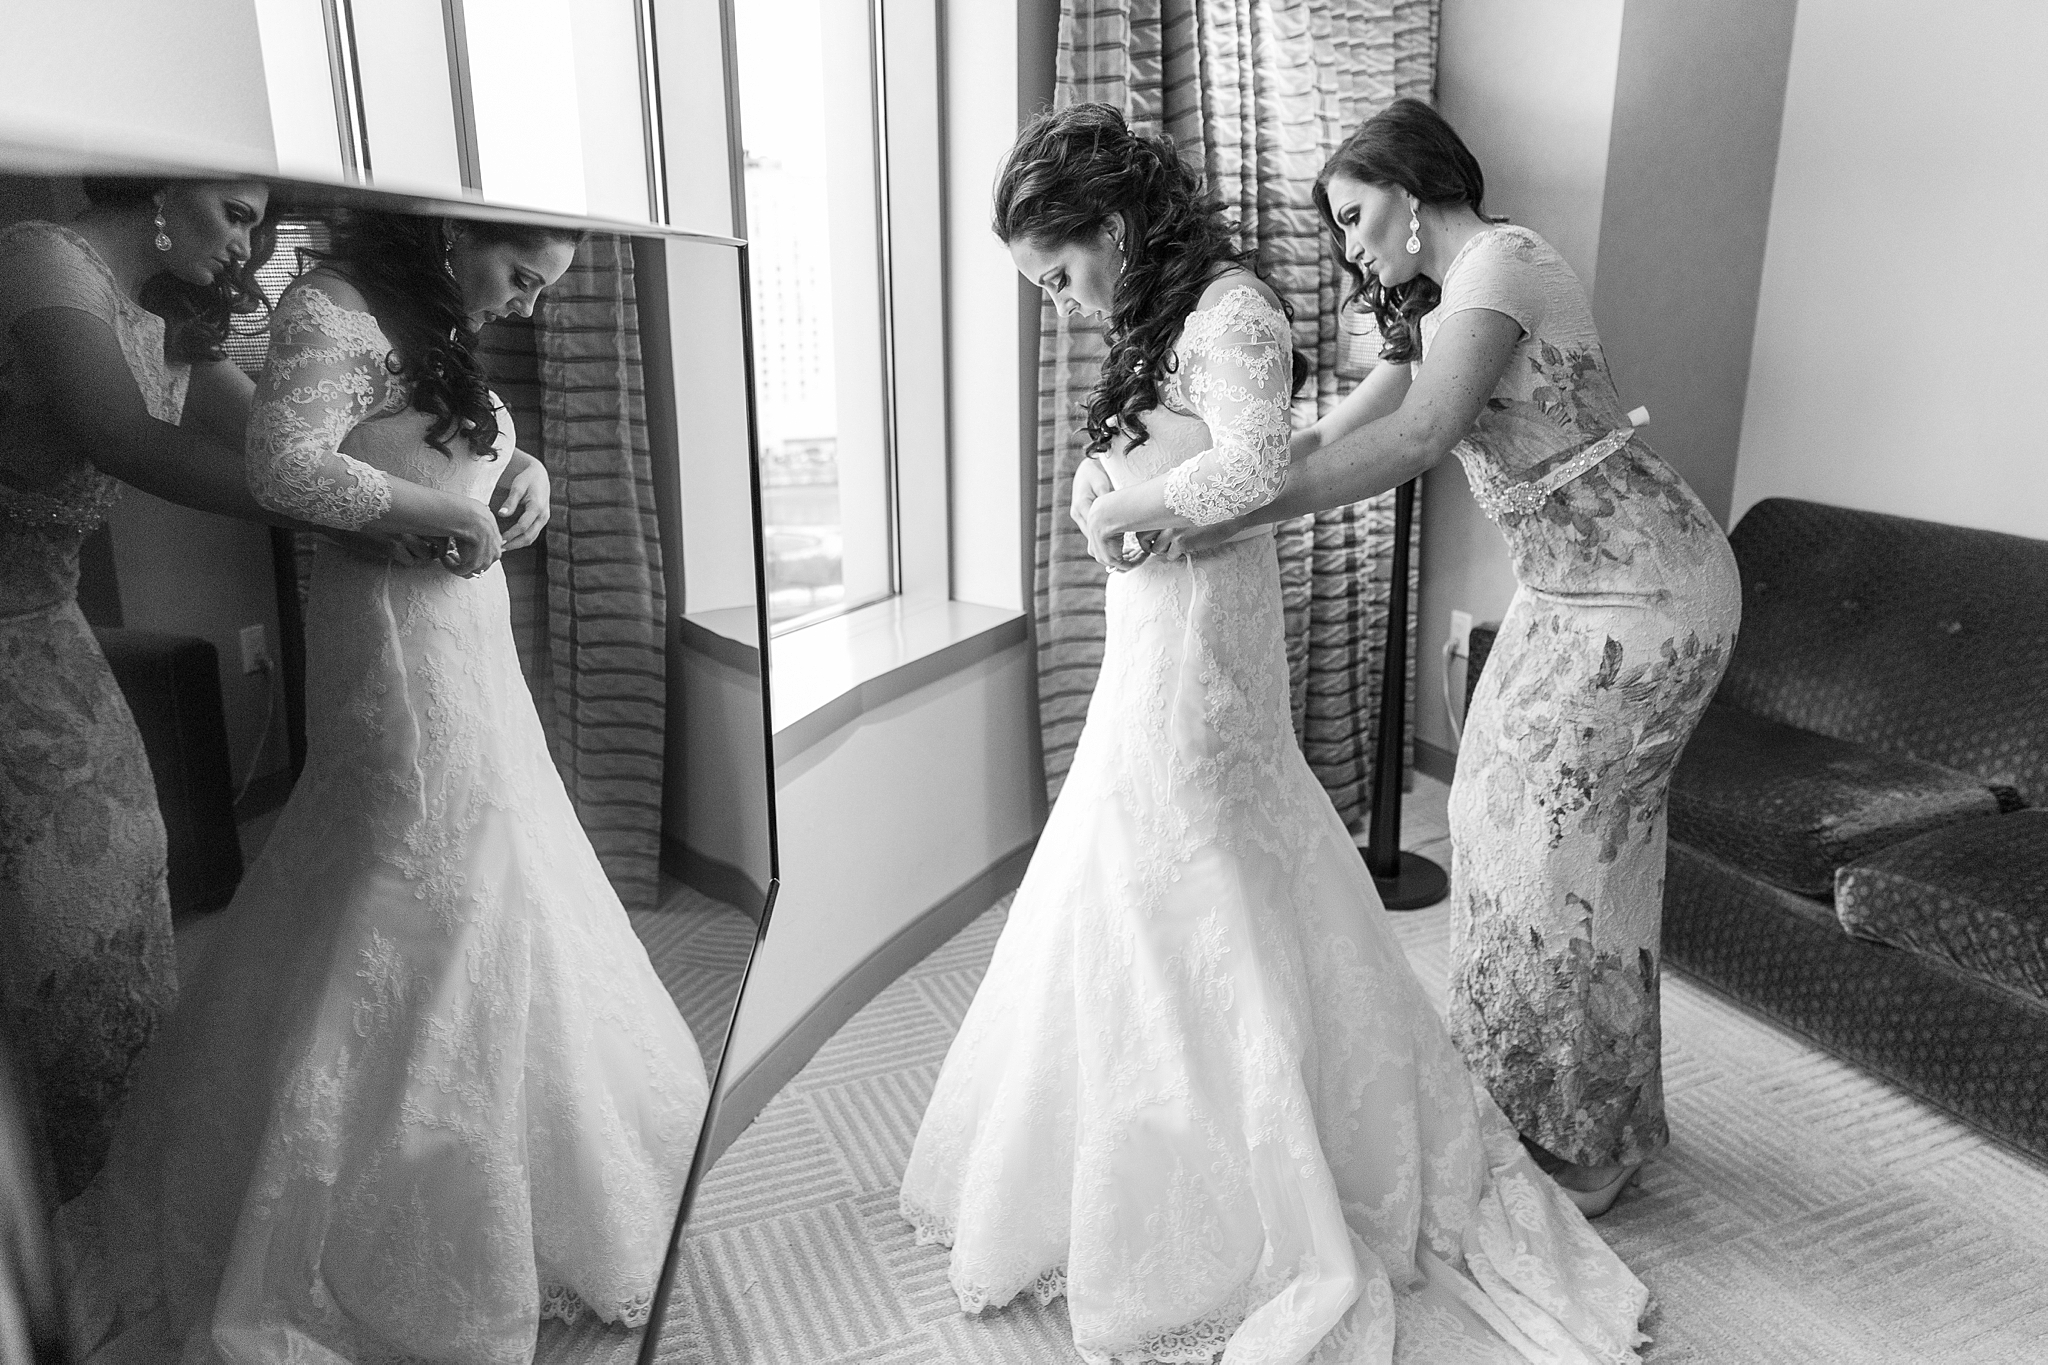 detroit-colony-club-wedding-regal-romantic-photography-in-detroit-mi-by-courtney-carolyn-photography_0007.jpg